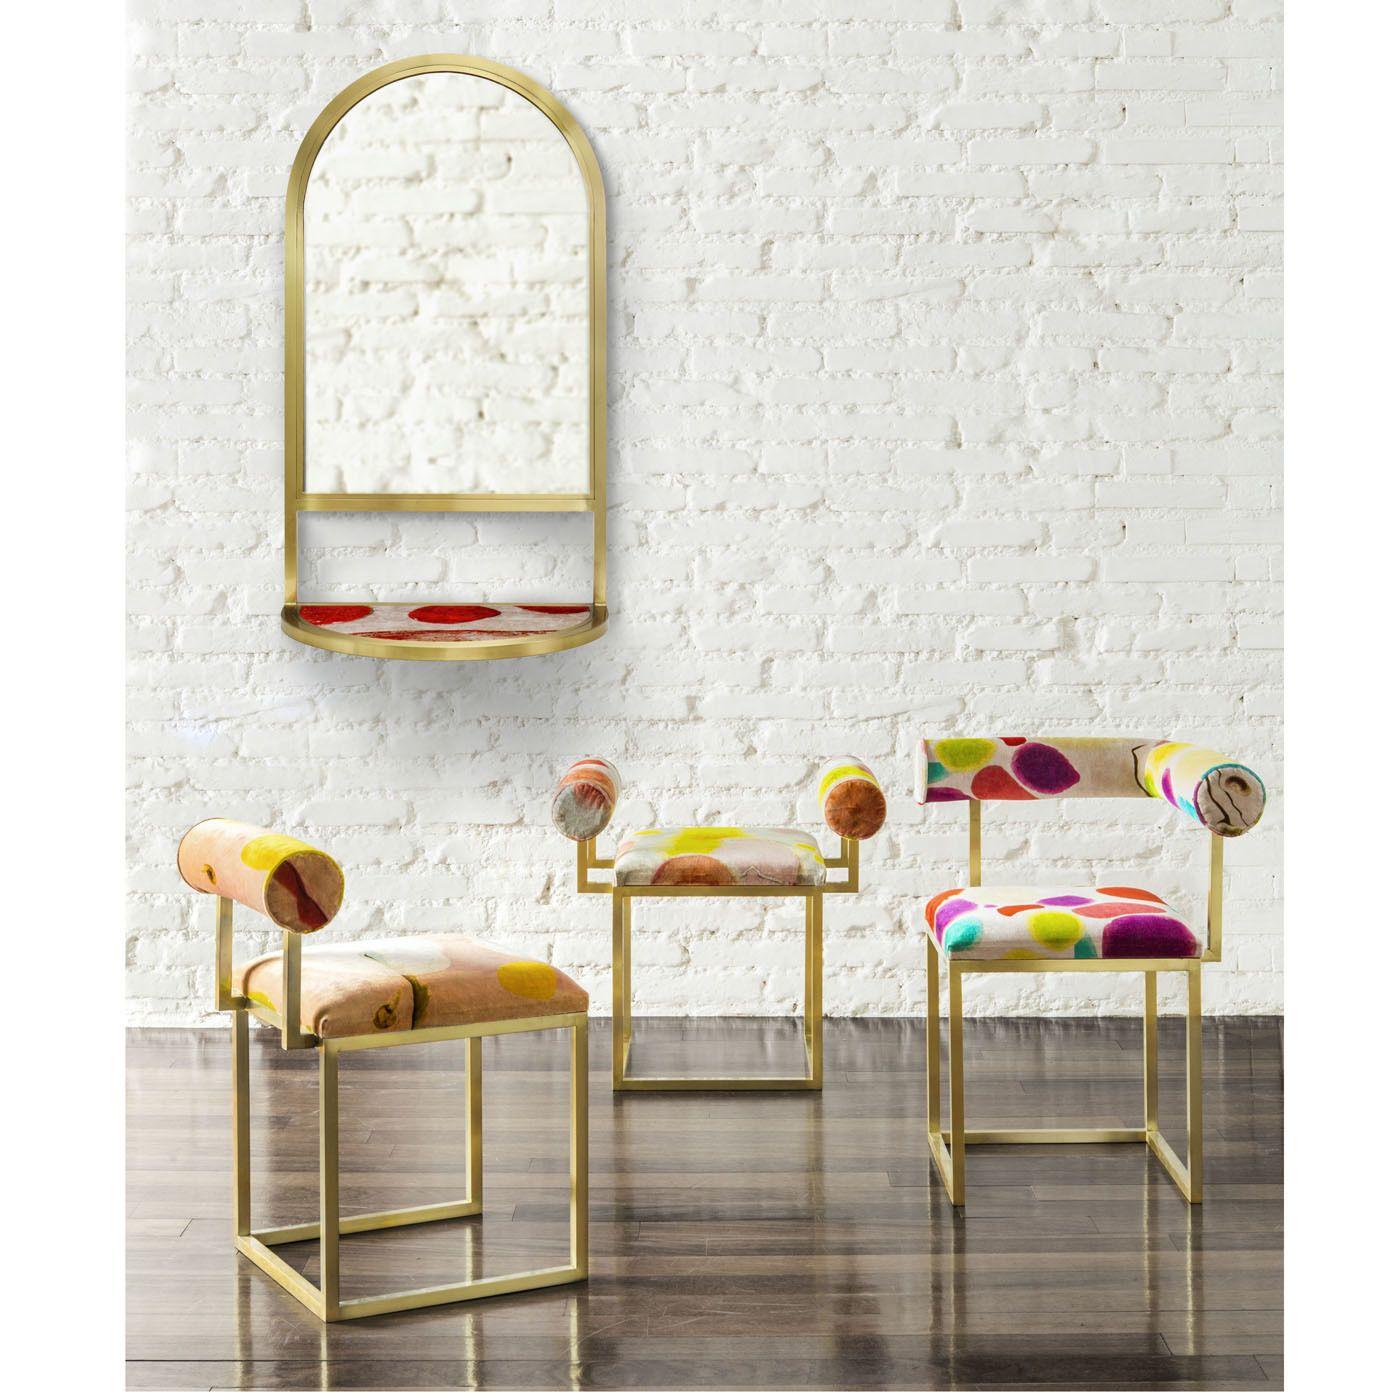 Awaiting H Stool By Giorgia Zanellato And Coralla Maiuri Shop Secondome Online At Artemest Chaise